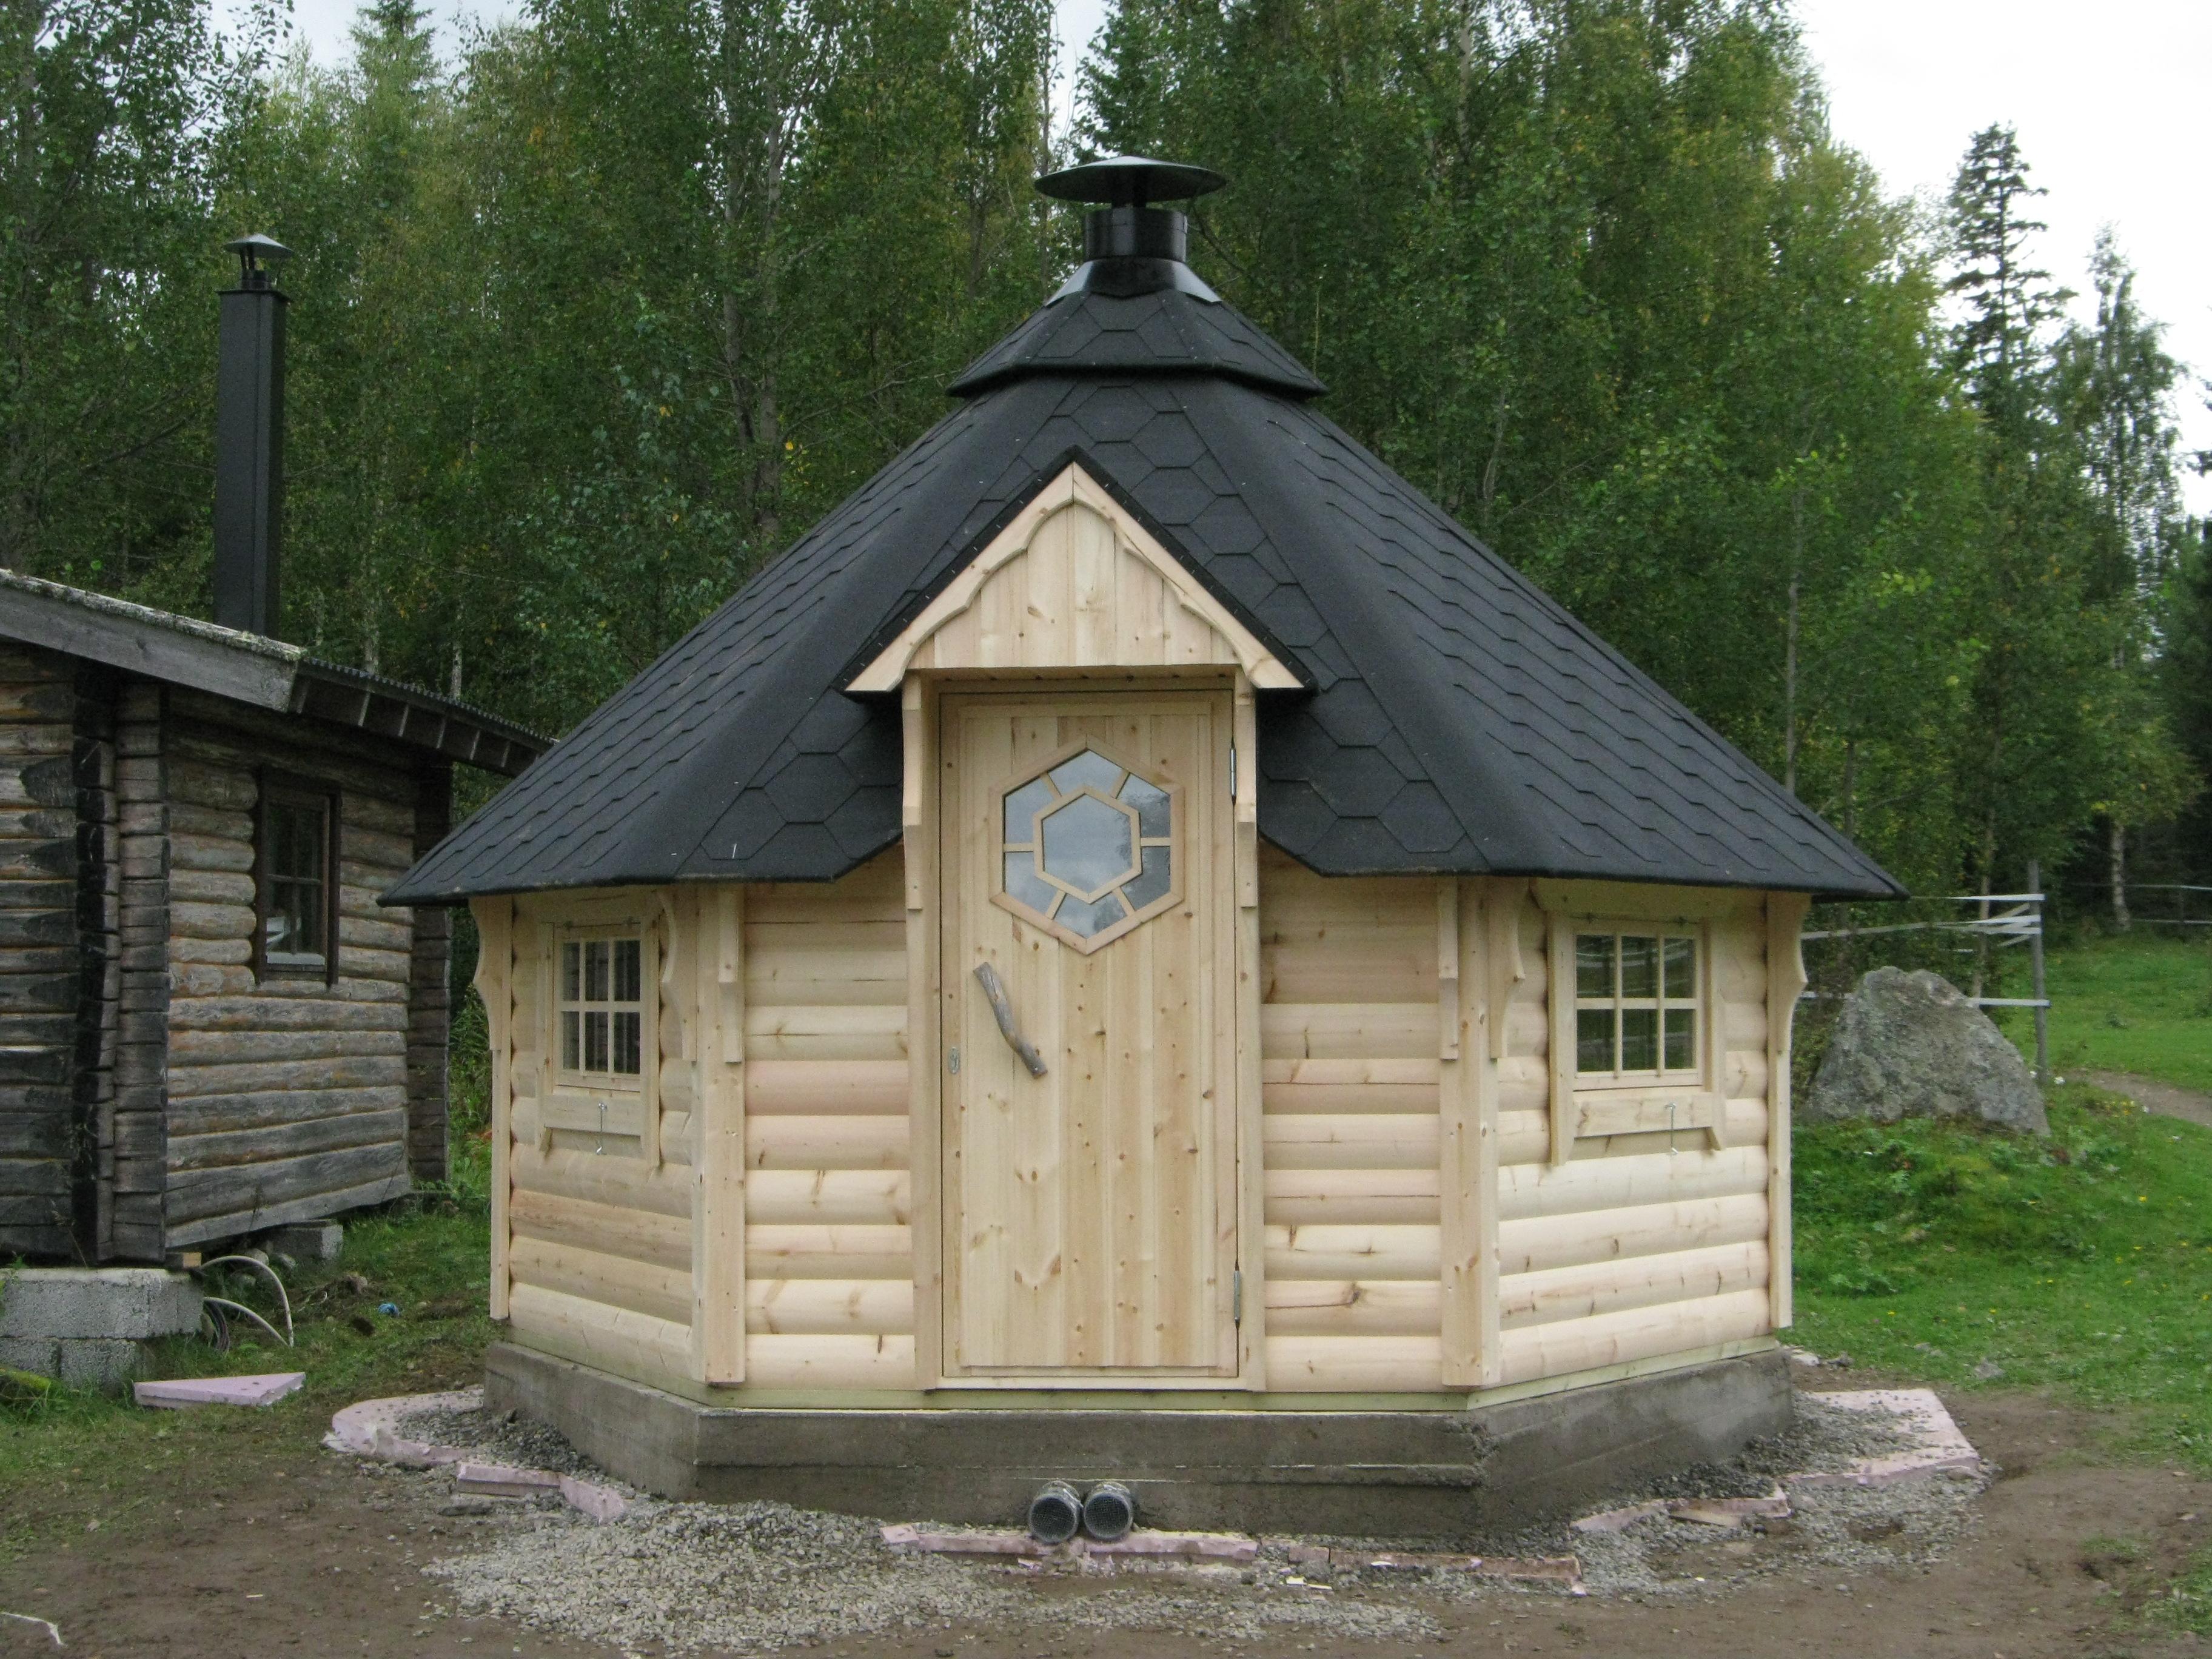 Grillkota Wikinger Grill 9,2 m2